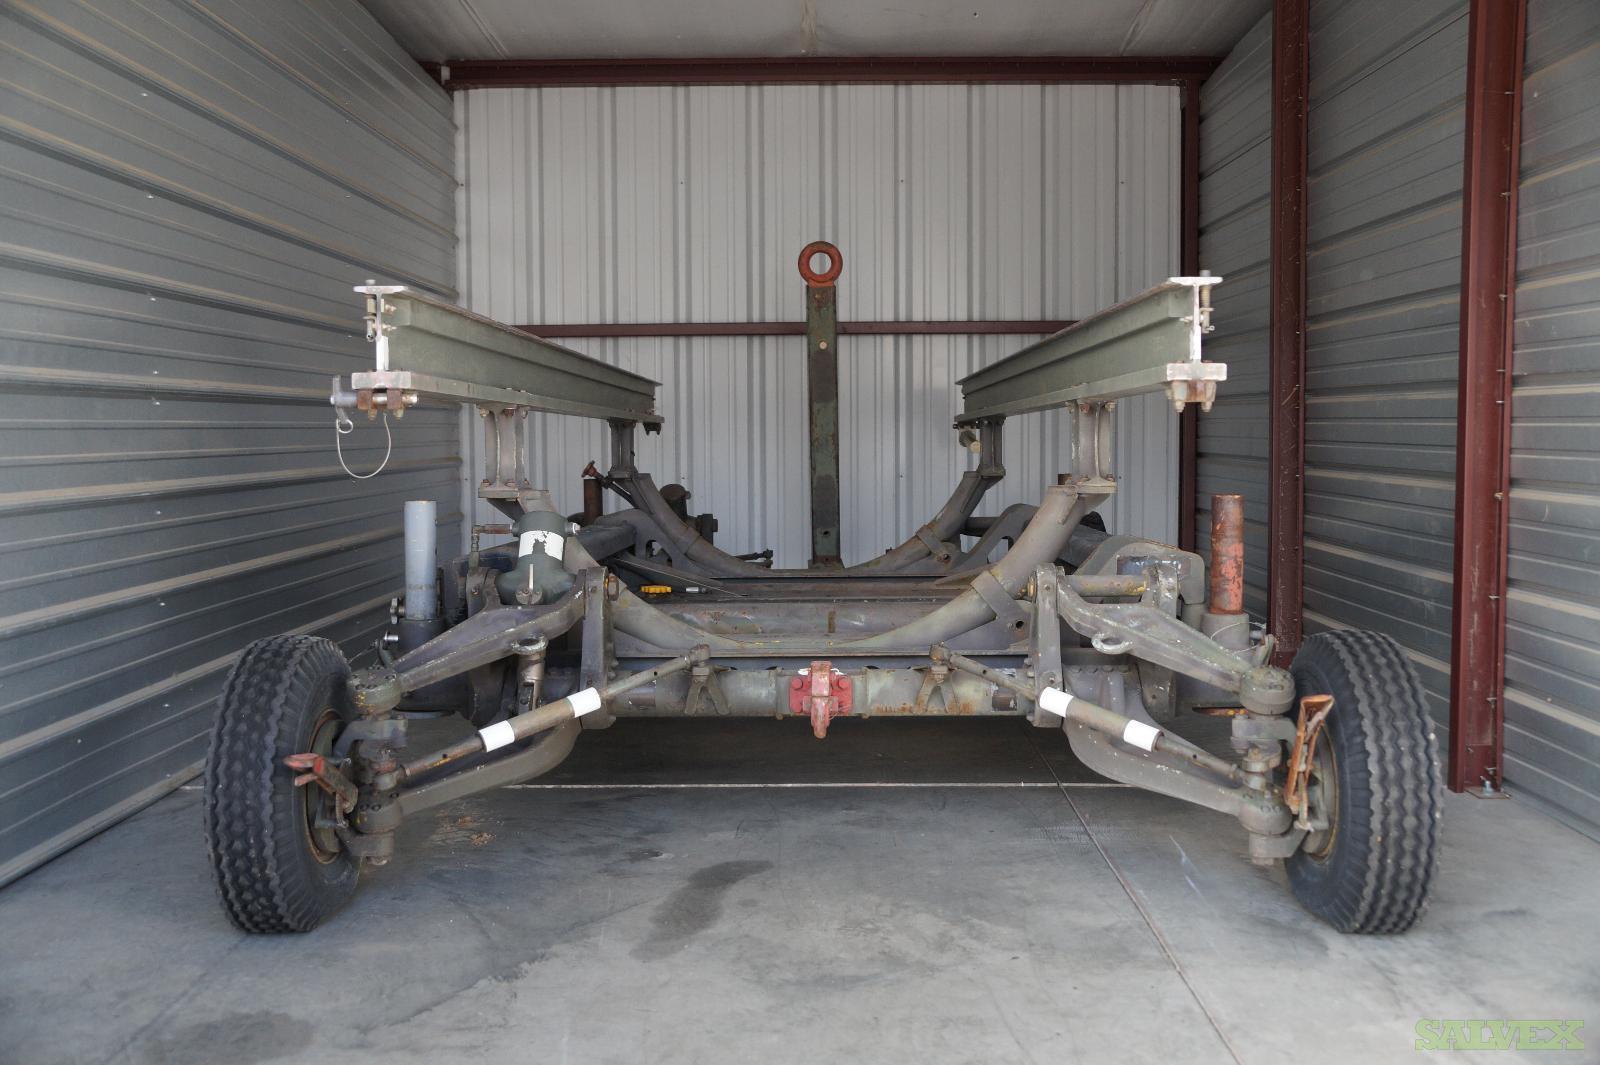 Air Logistics 4000A Aircraft Engine Removal Trailer